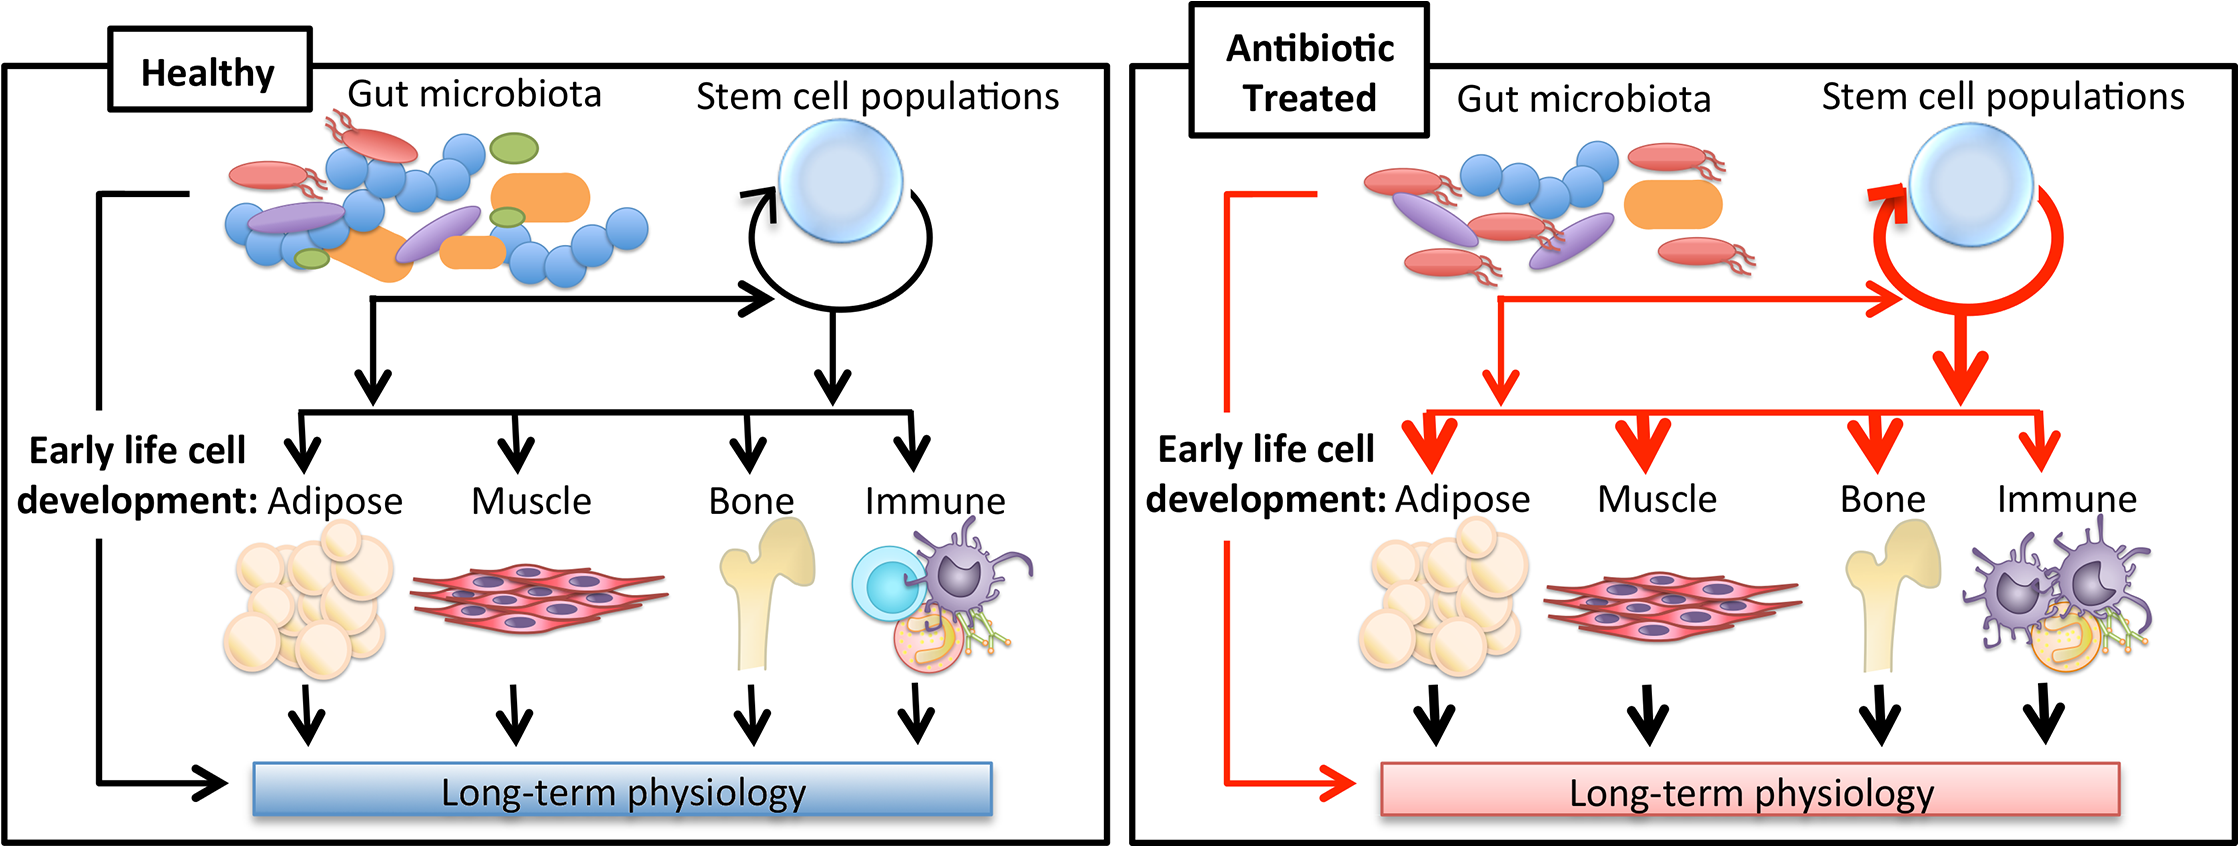 Impact of antibiotics on long-term physiology through microbiota changes.